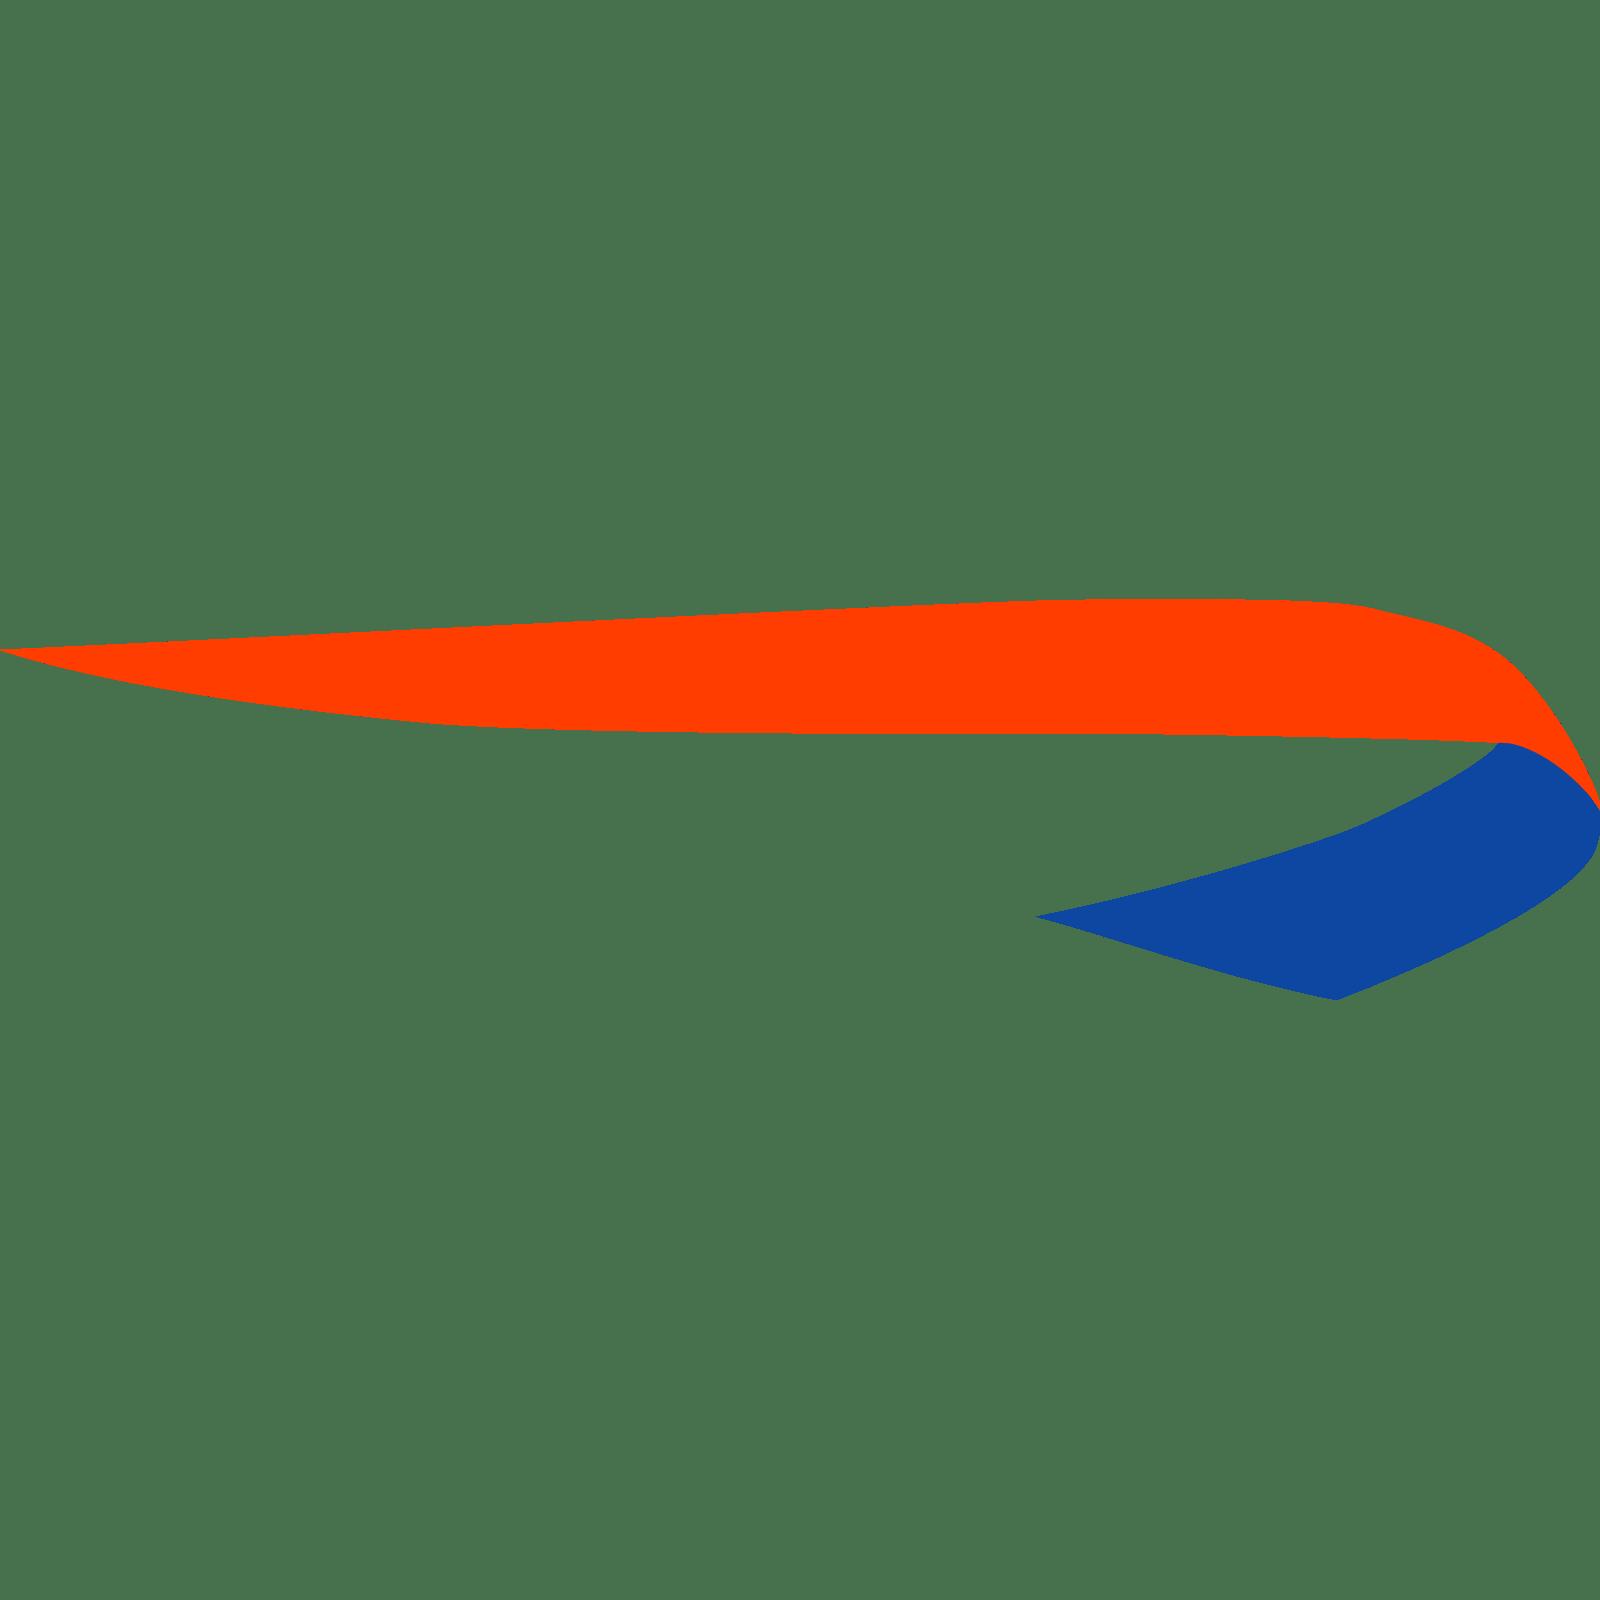 British Airways Vector PNG - 35032